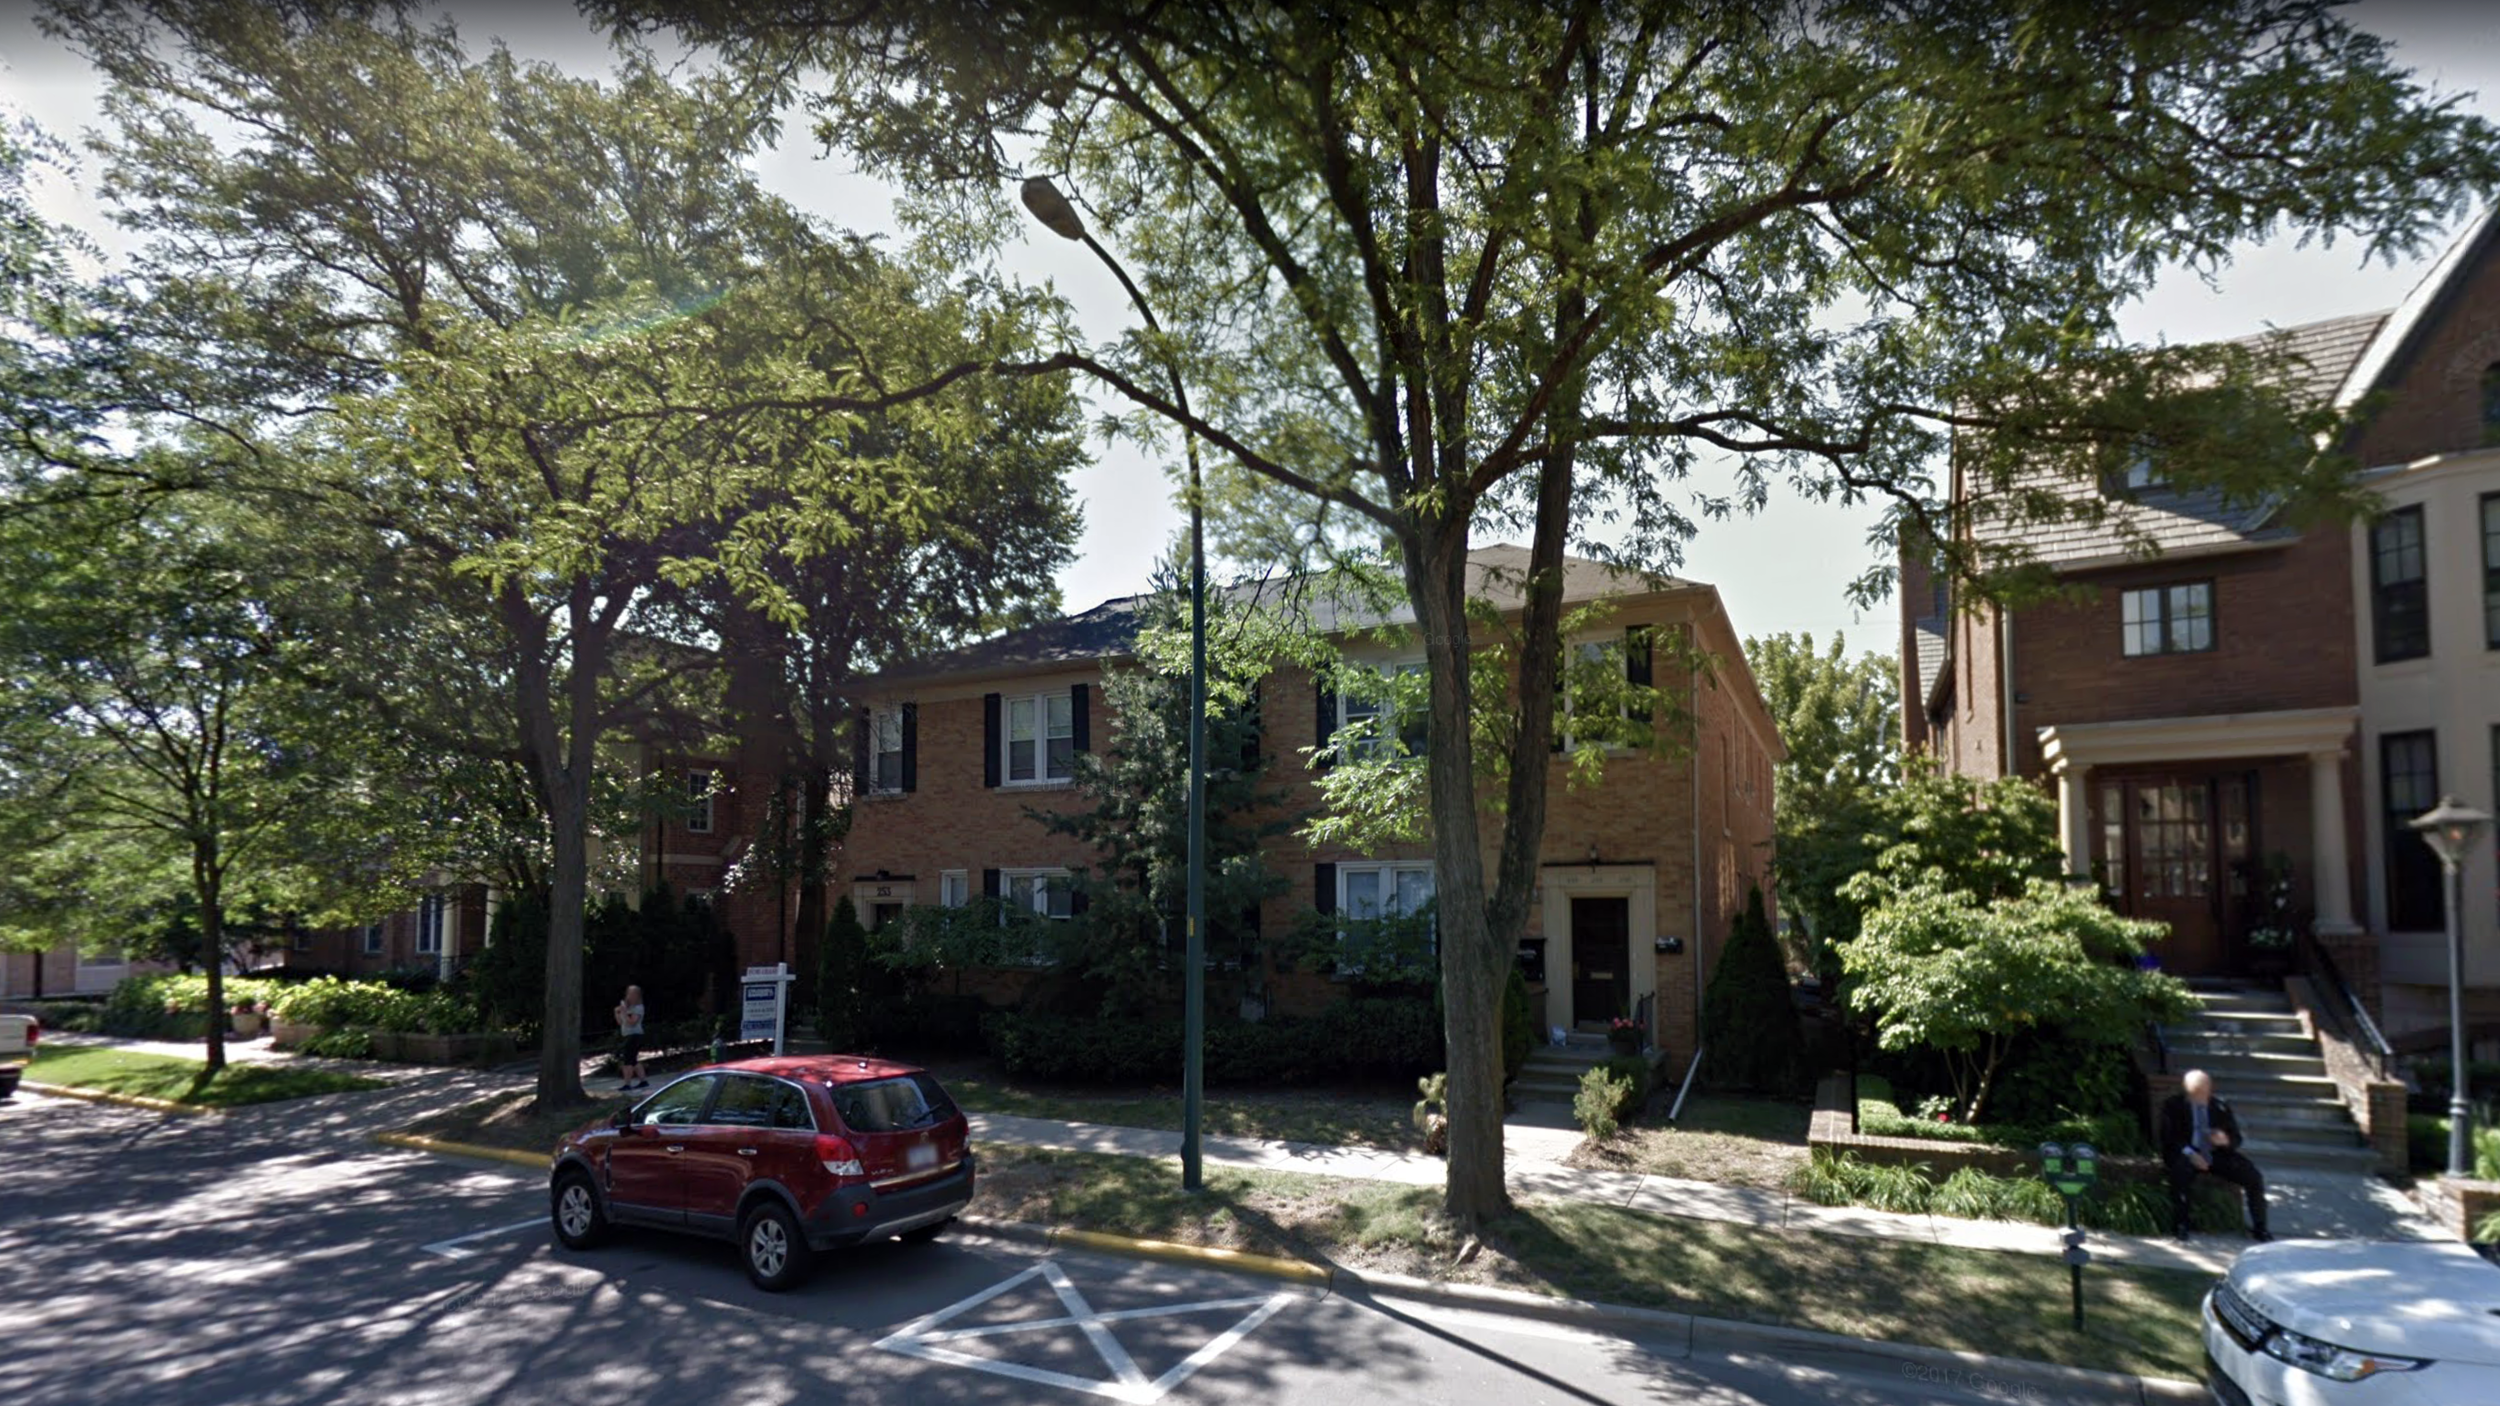 1988  257 West Brown Street, Birmingham, Michigan